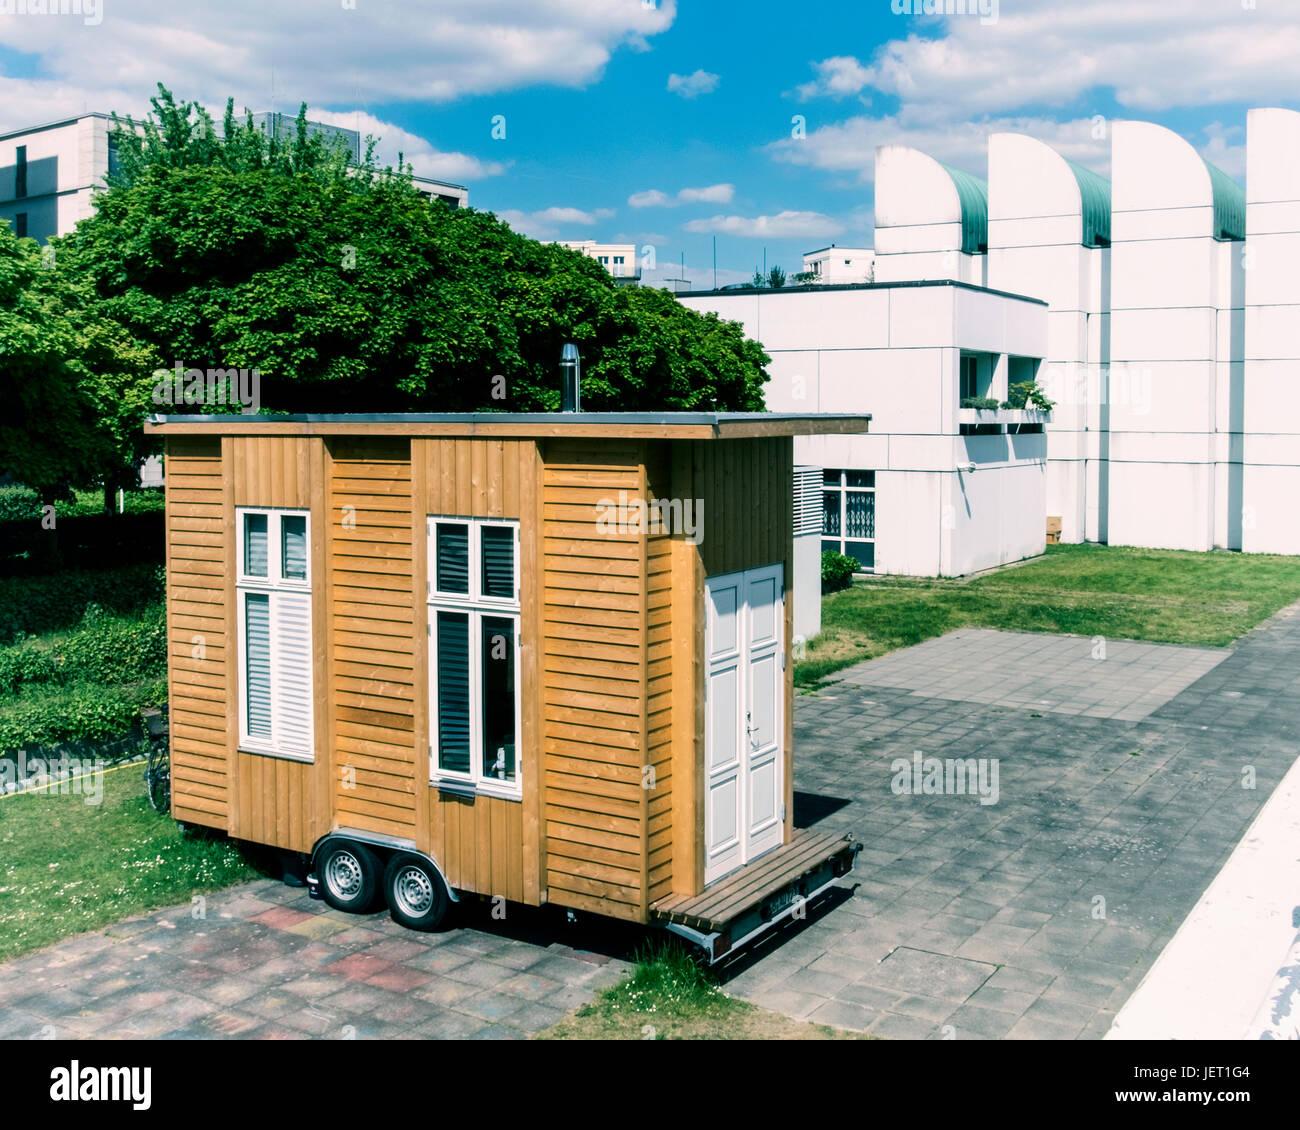 urban villa germany stockfotos urban villa germany bilder alamy. Black Bedroom Furniture Sets. Home Design Ideas